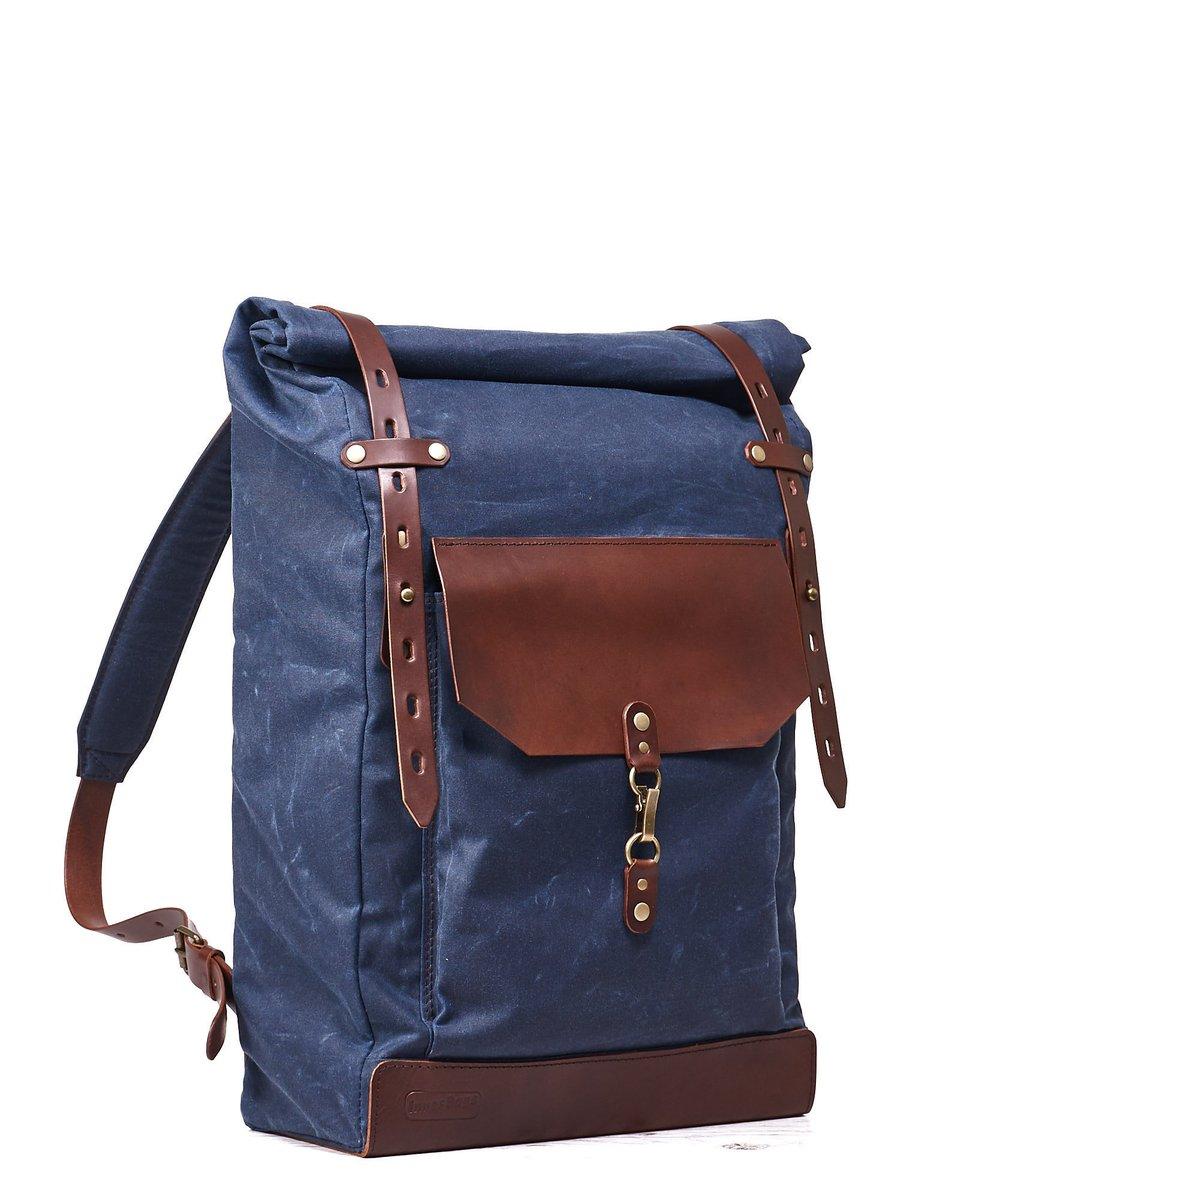 https   buff.ly 2Kf7vmK  waxedcanvas  leather  waxedcanvasbag  backpack   rolltopbag  rolltopbackpack  handmade   handmadebagpic.twitter.com T3eq2rQqss 041ee9911b53a